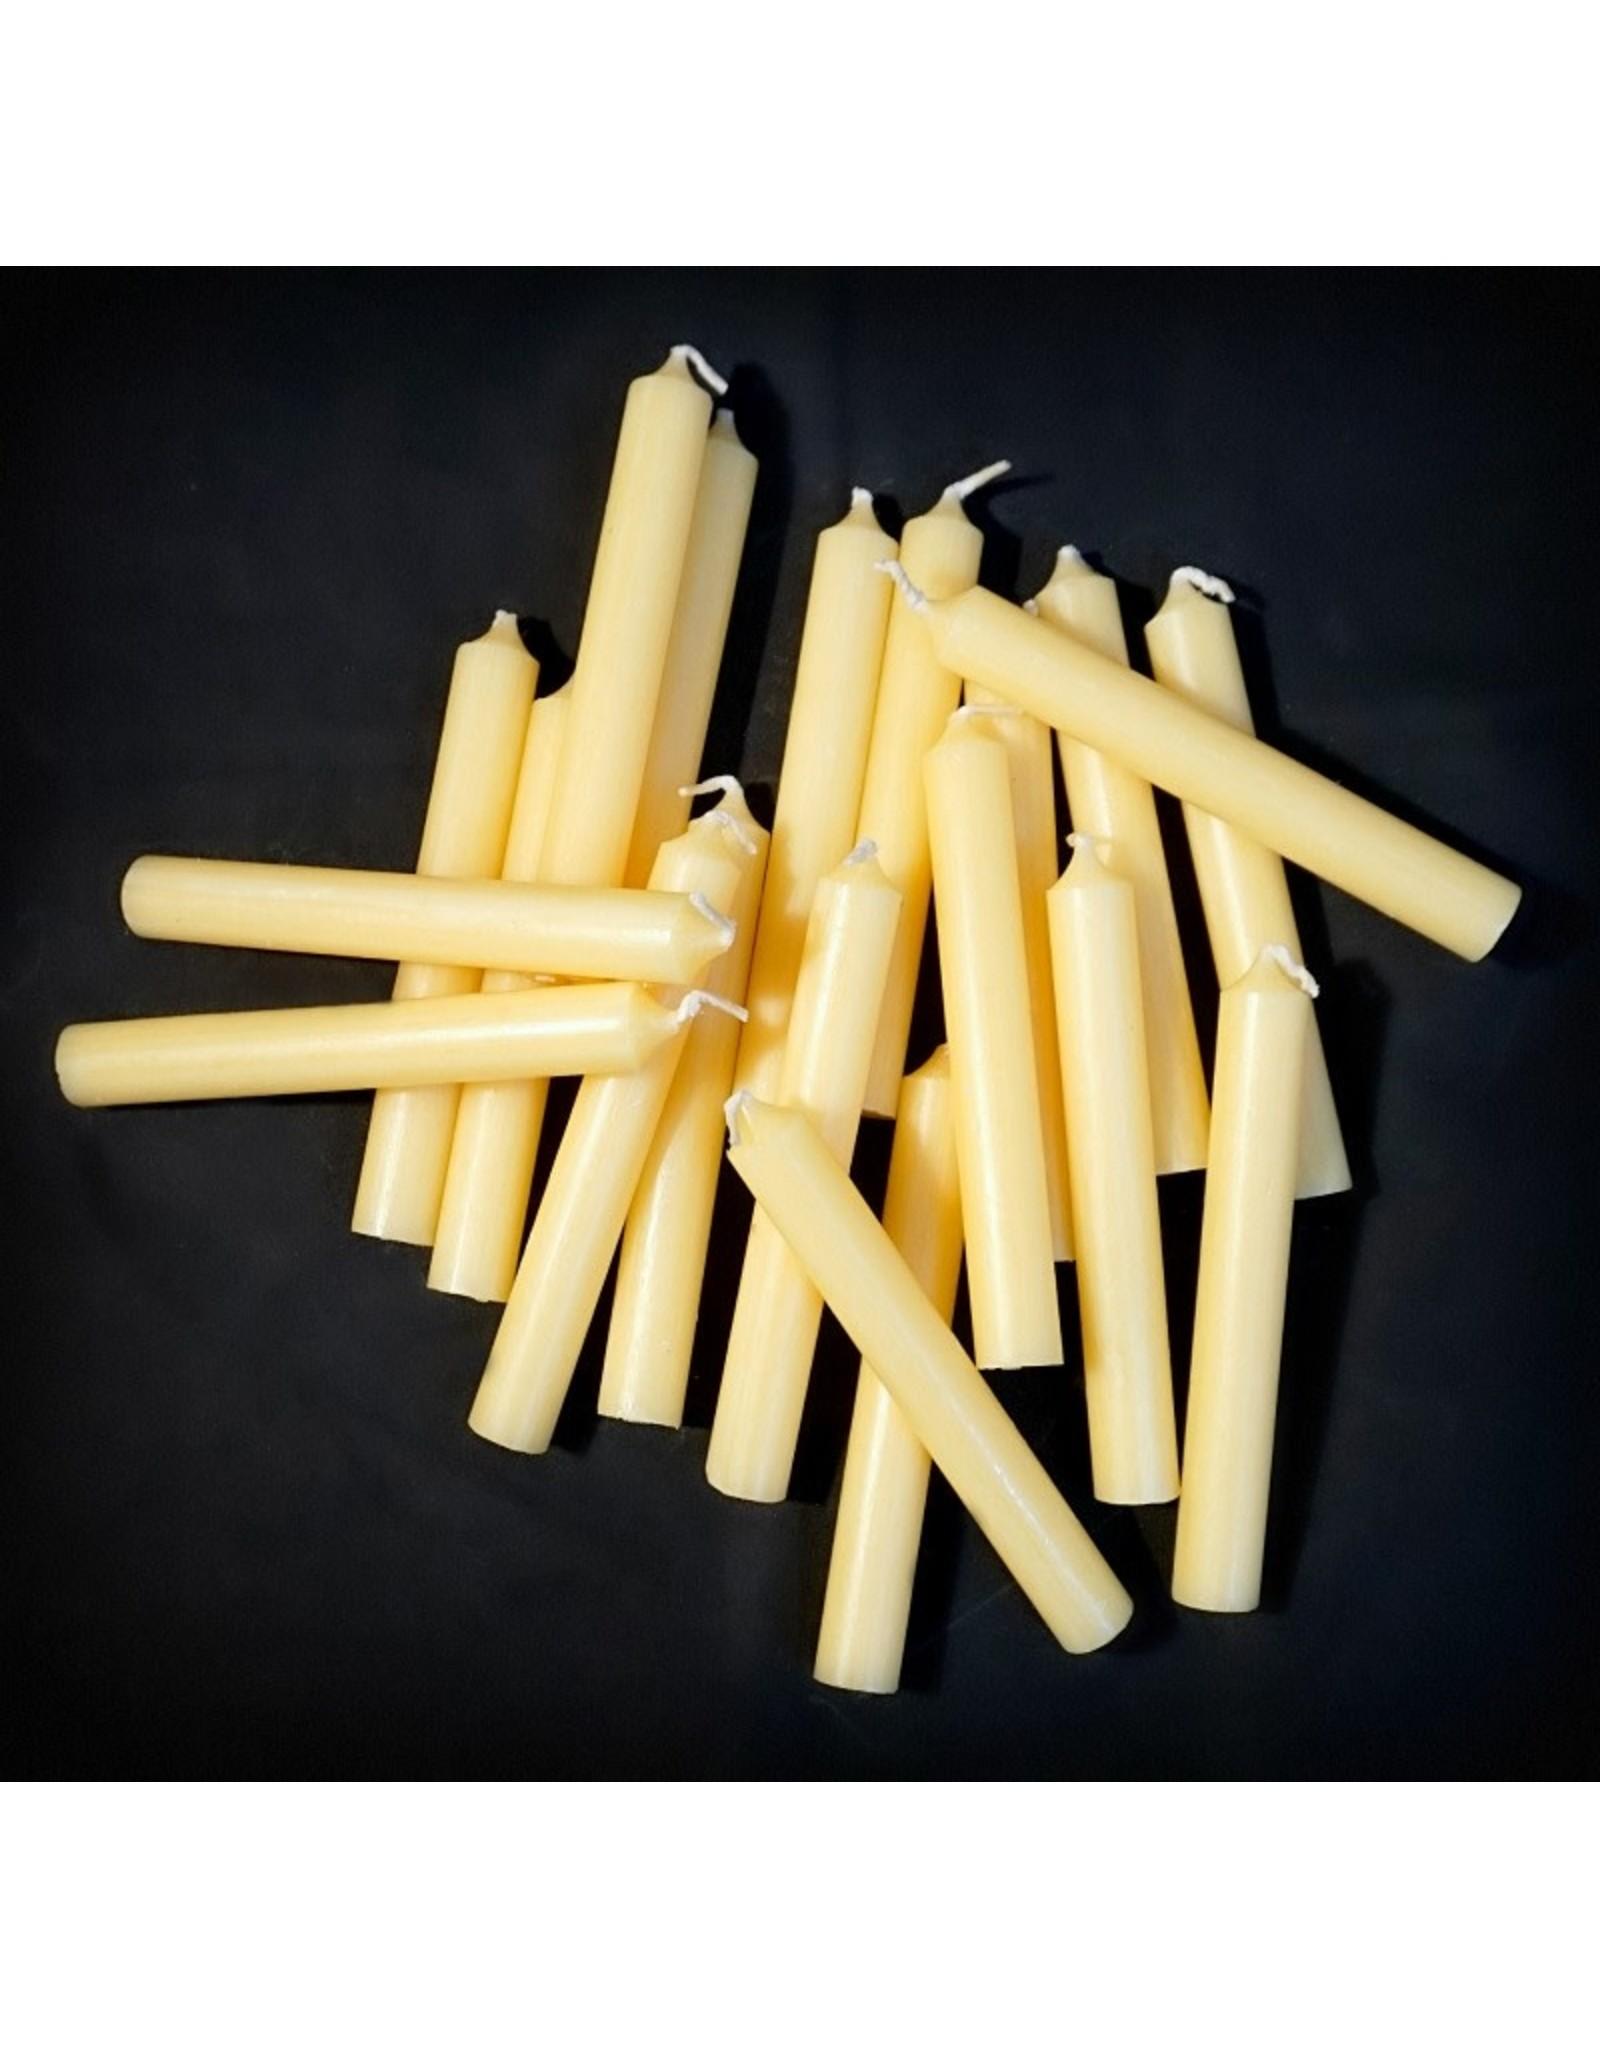 Ivory Chime Candle - Motivation